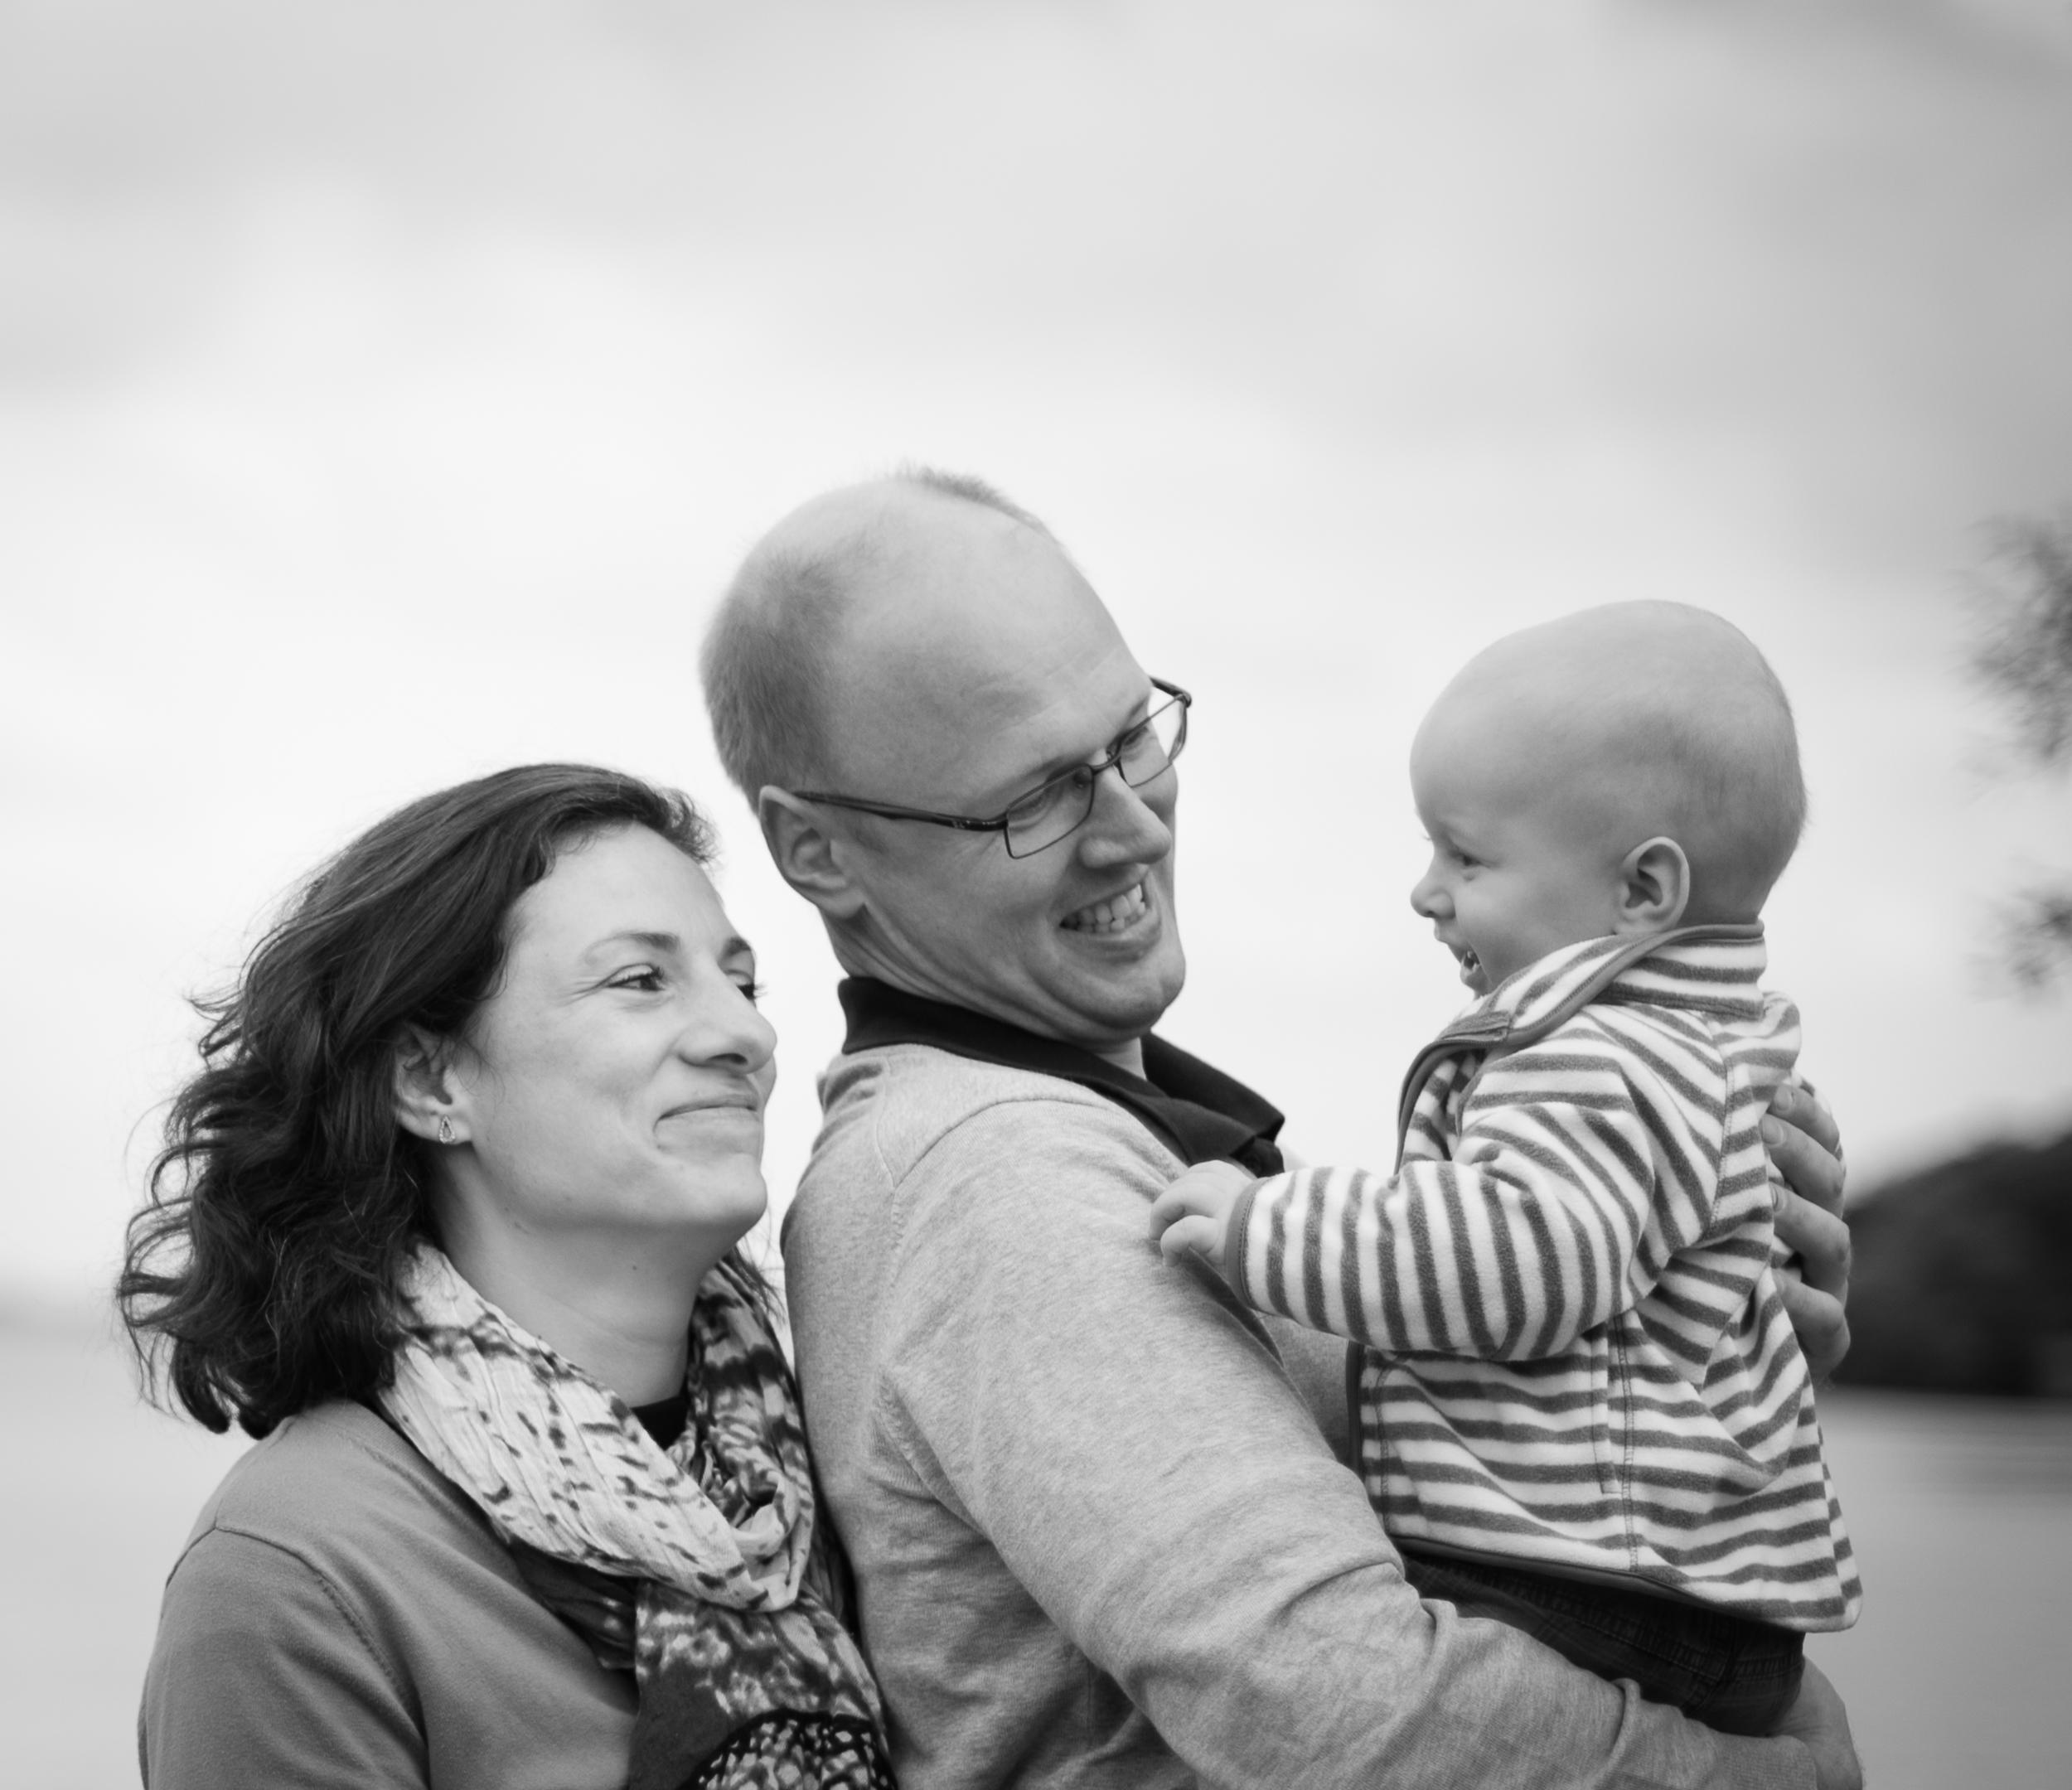 Family Portraits, Esrum Lake, Denmark.